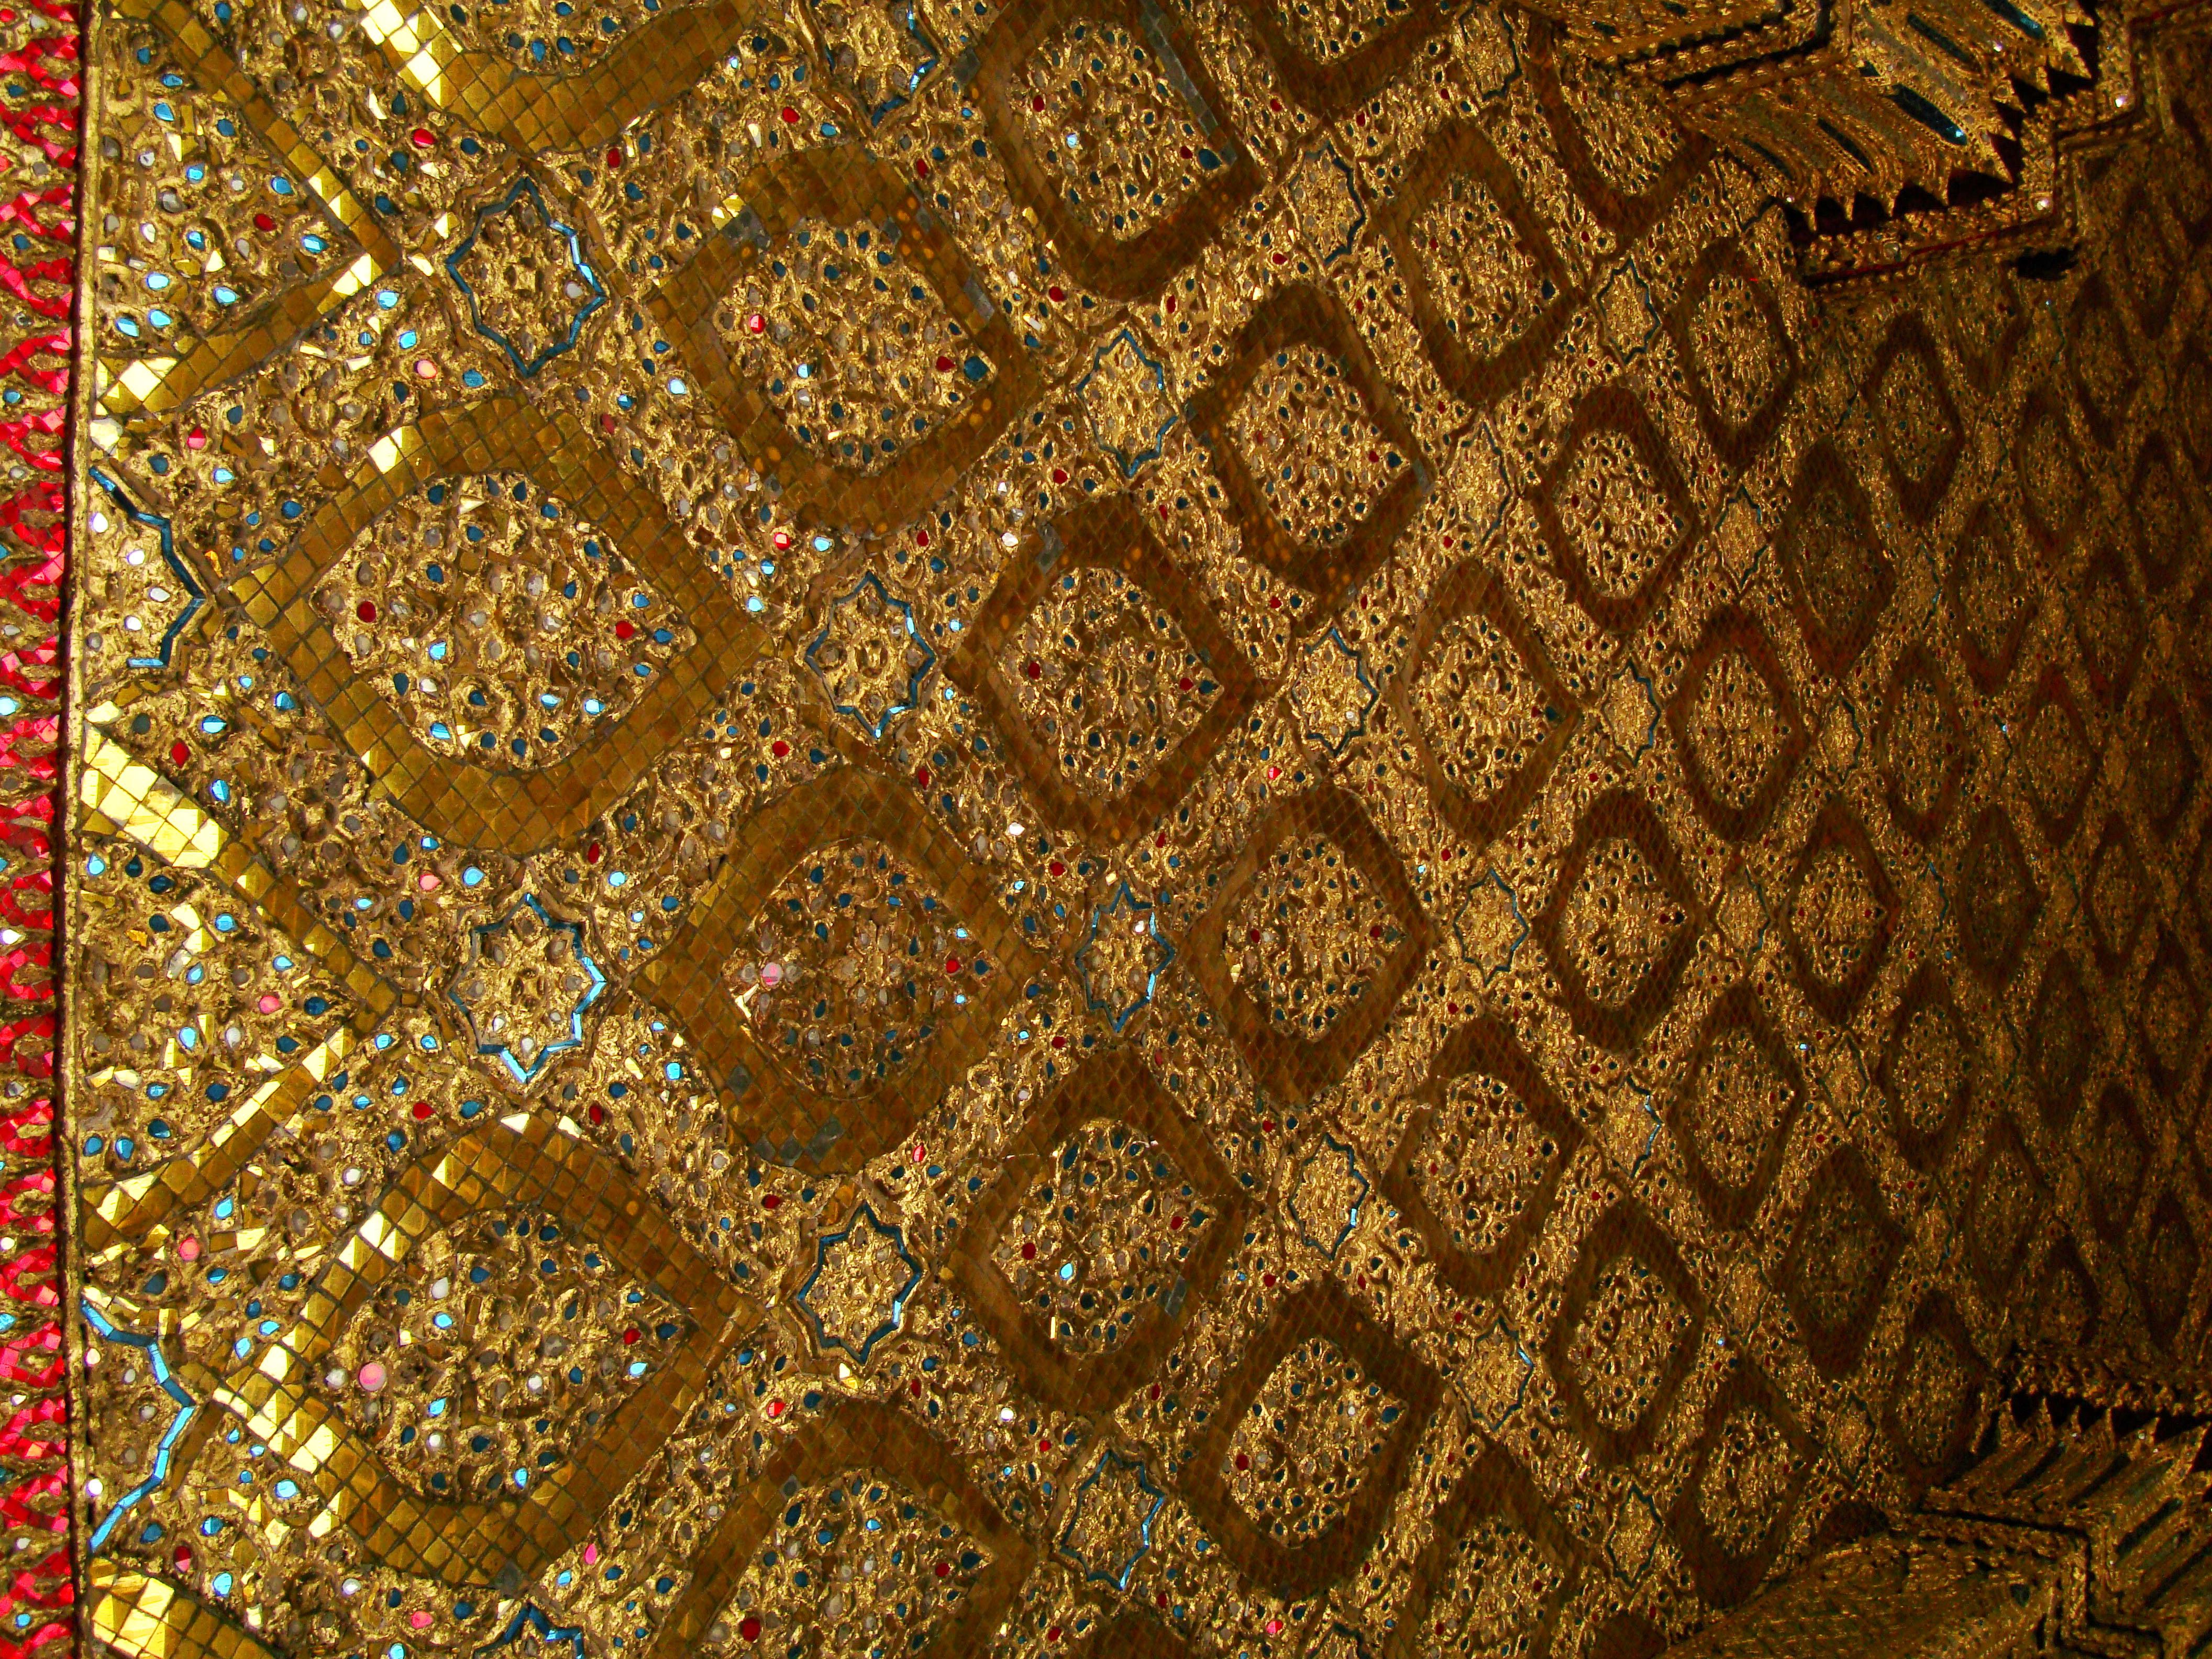 10 Temple of the Emerald Buddha intercrit designed walls pillars Grand Palace 09